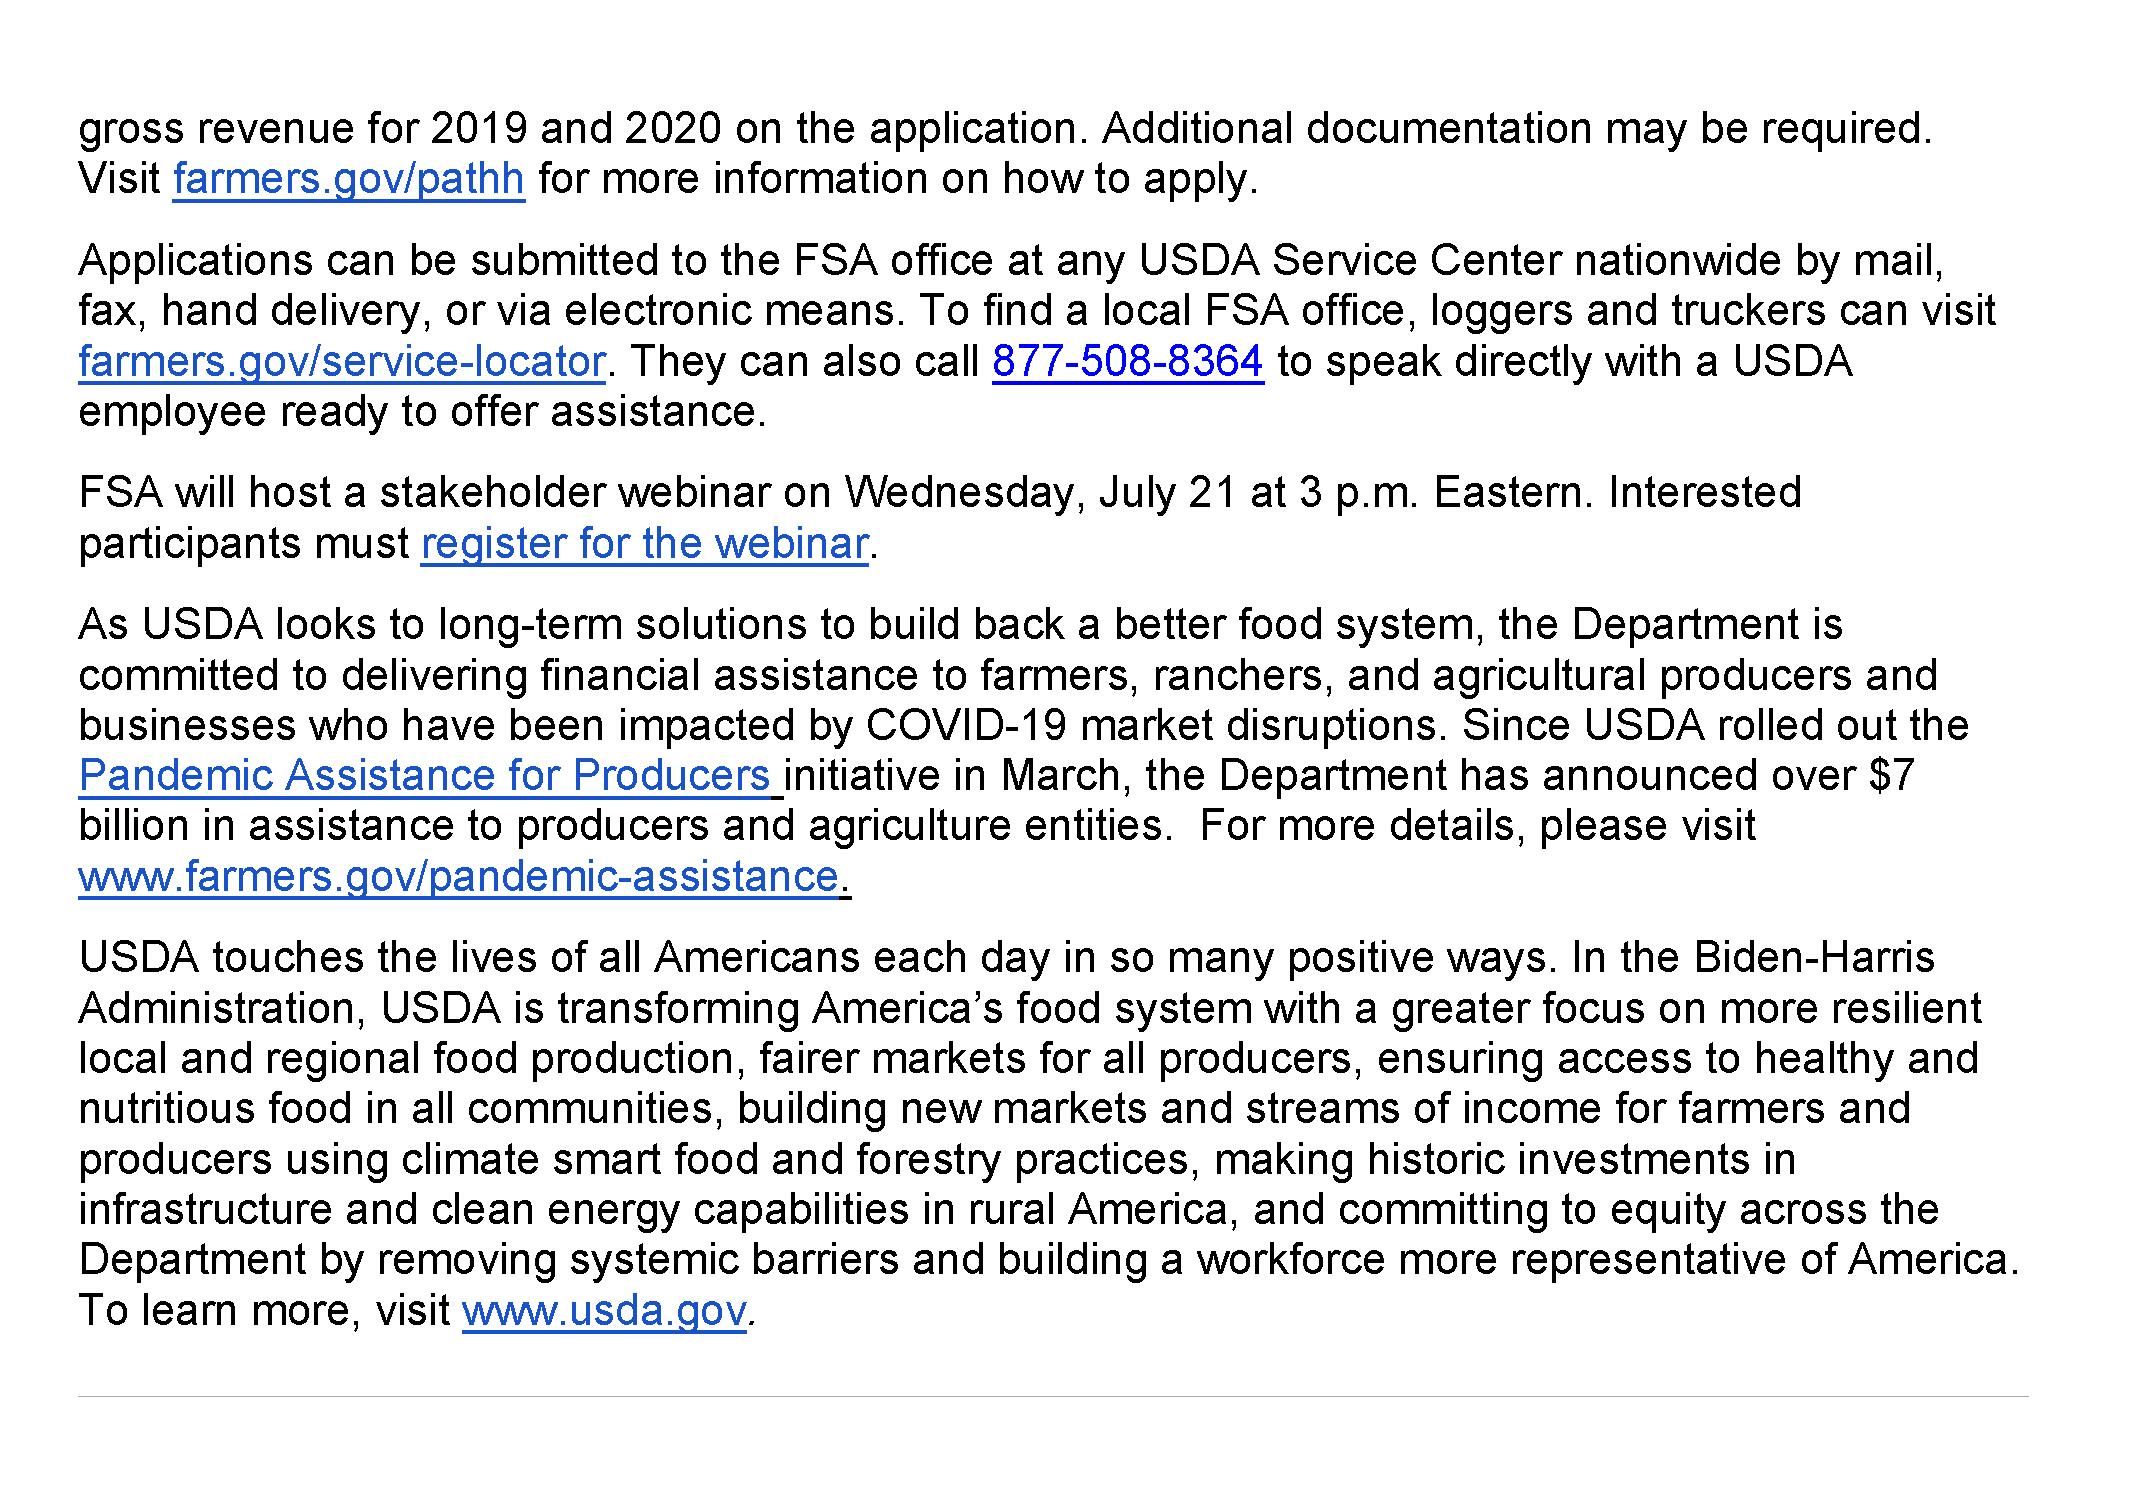 USDA Pandemic Assistance Informstional